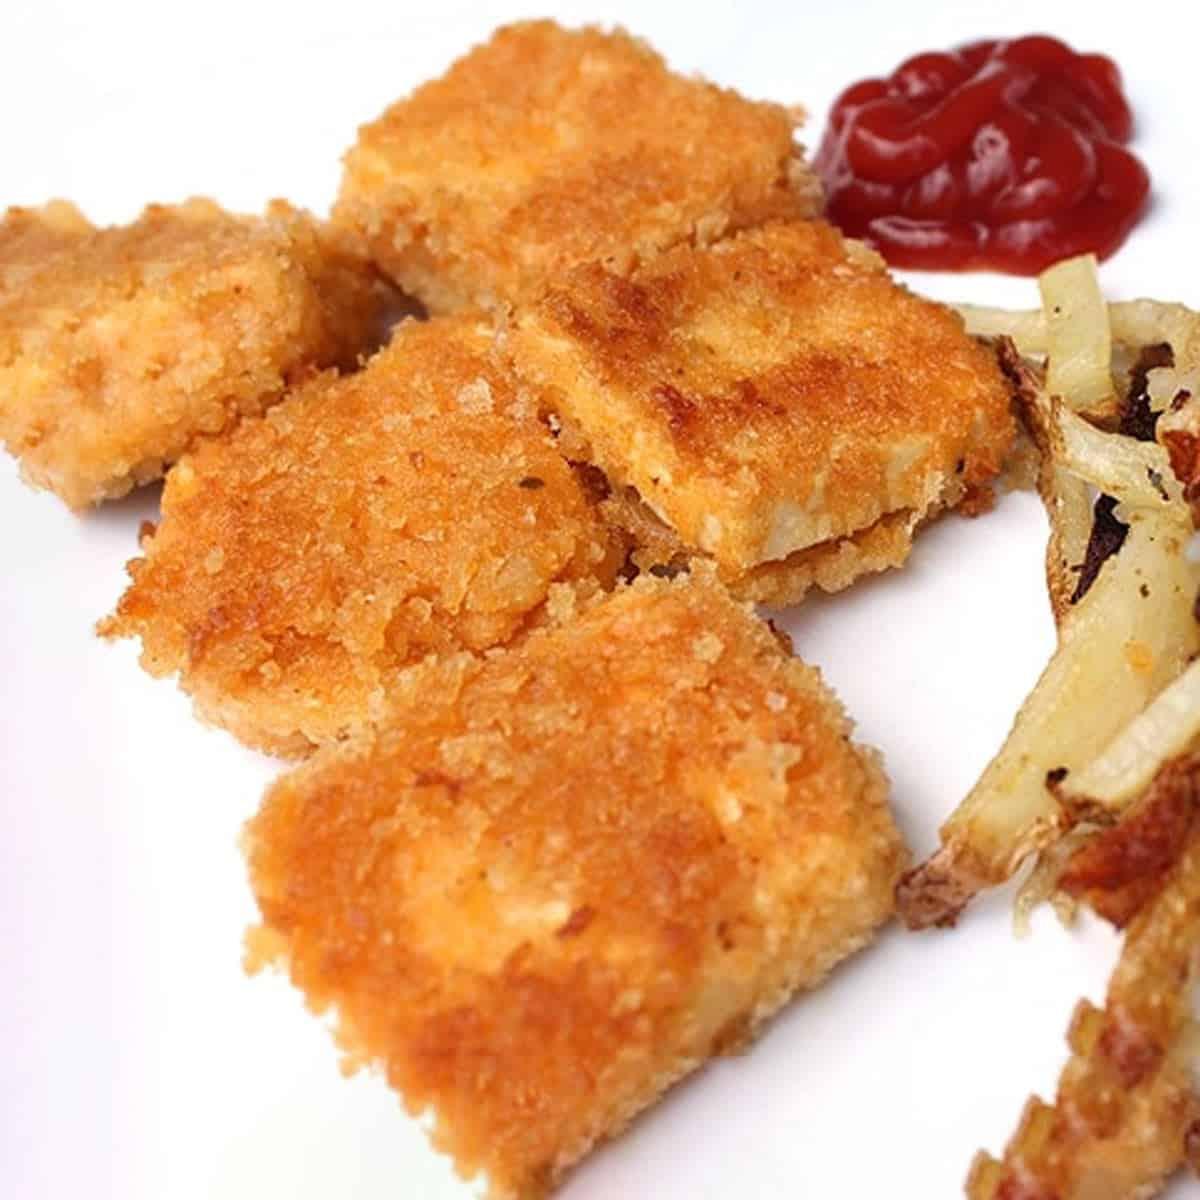 Panko Fried Tofu Nuggets with ketchup.